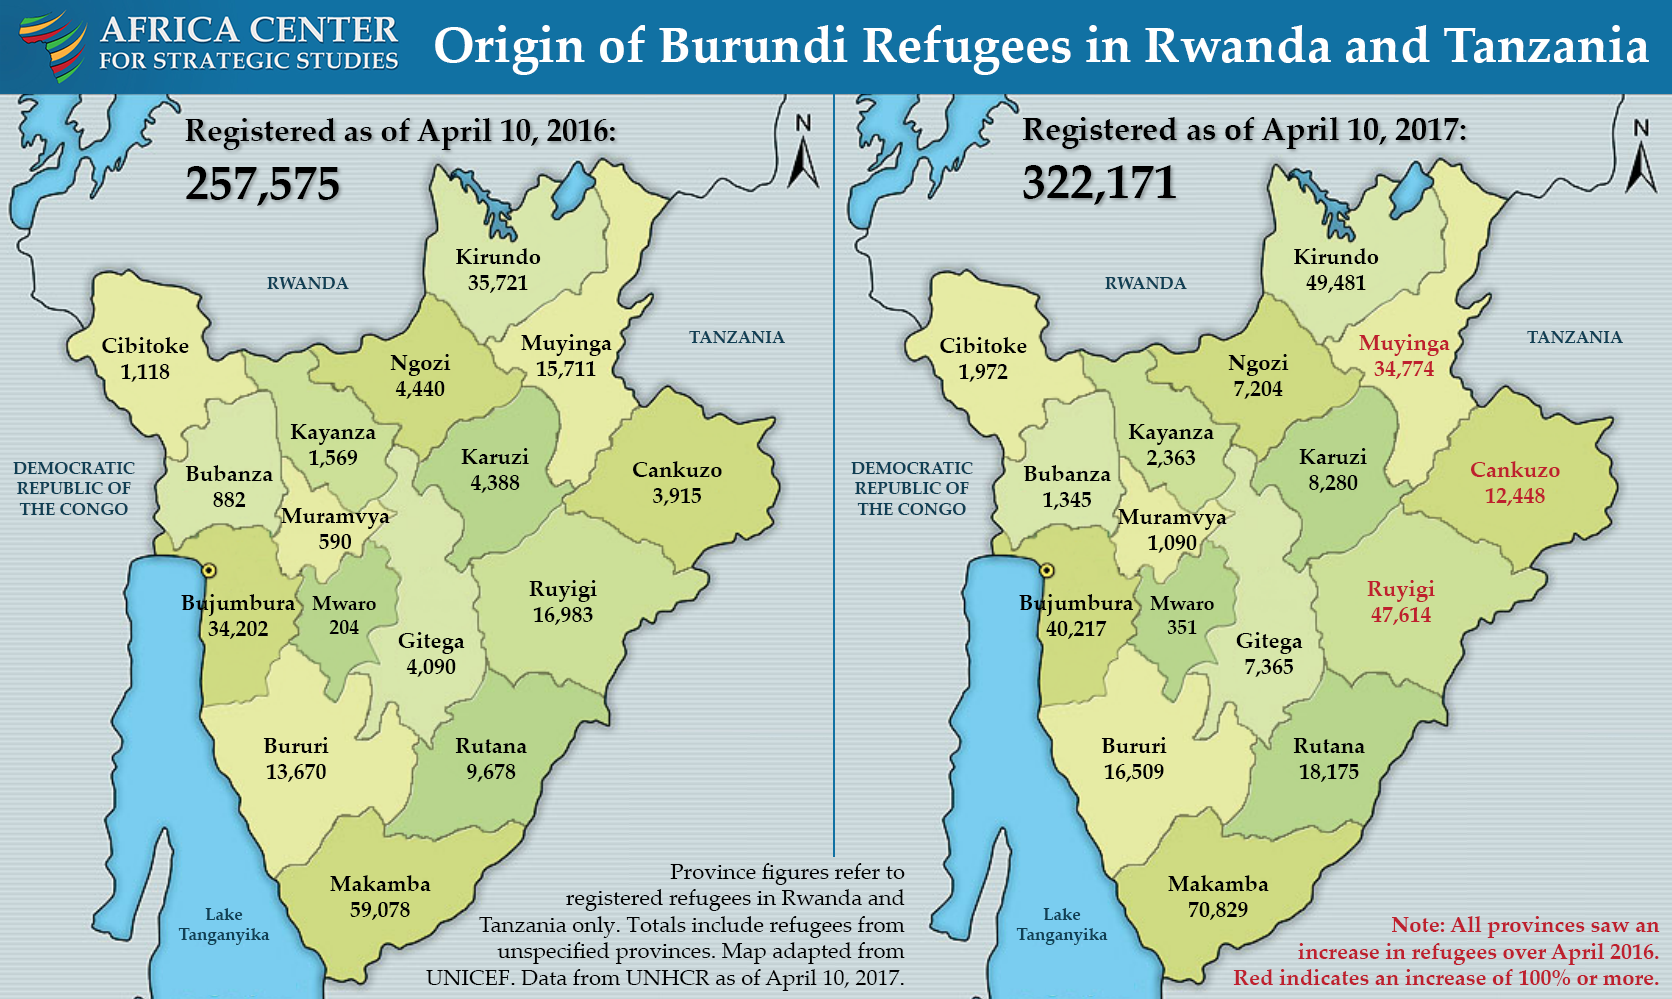 Burundi refugee flows by province of origin